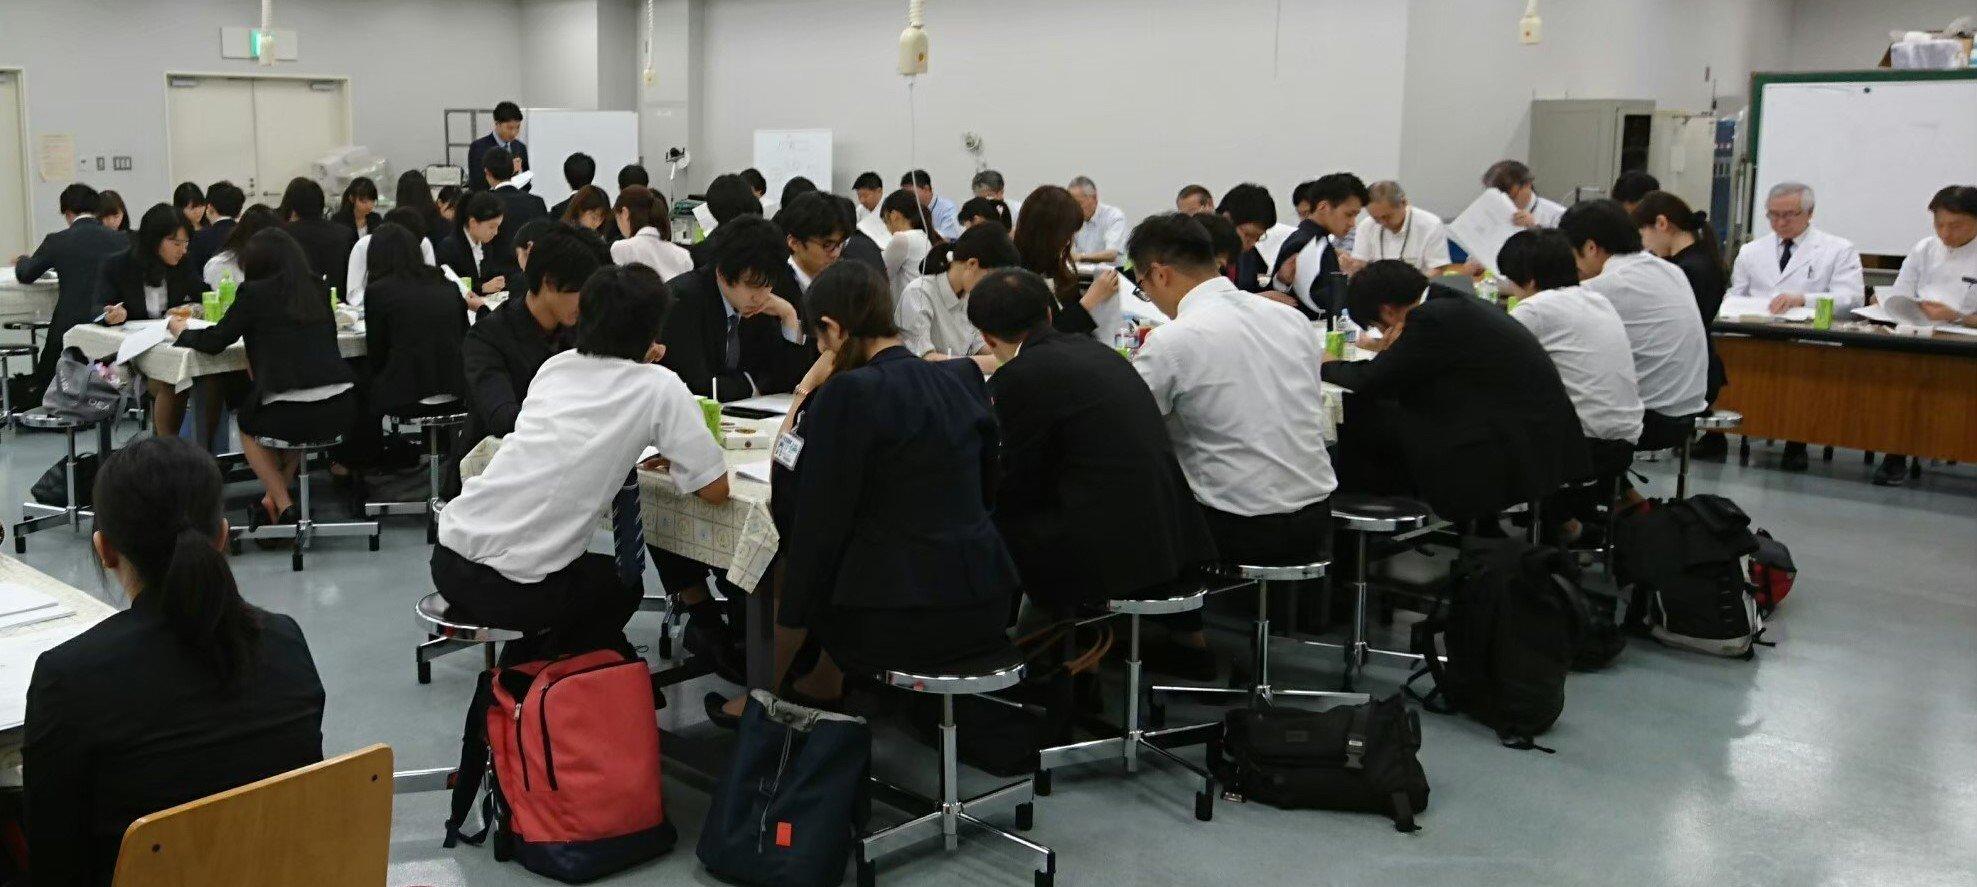 IMG_9211 - カワイモトキ.JPG